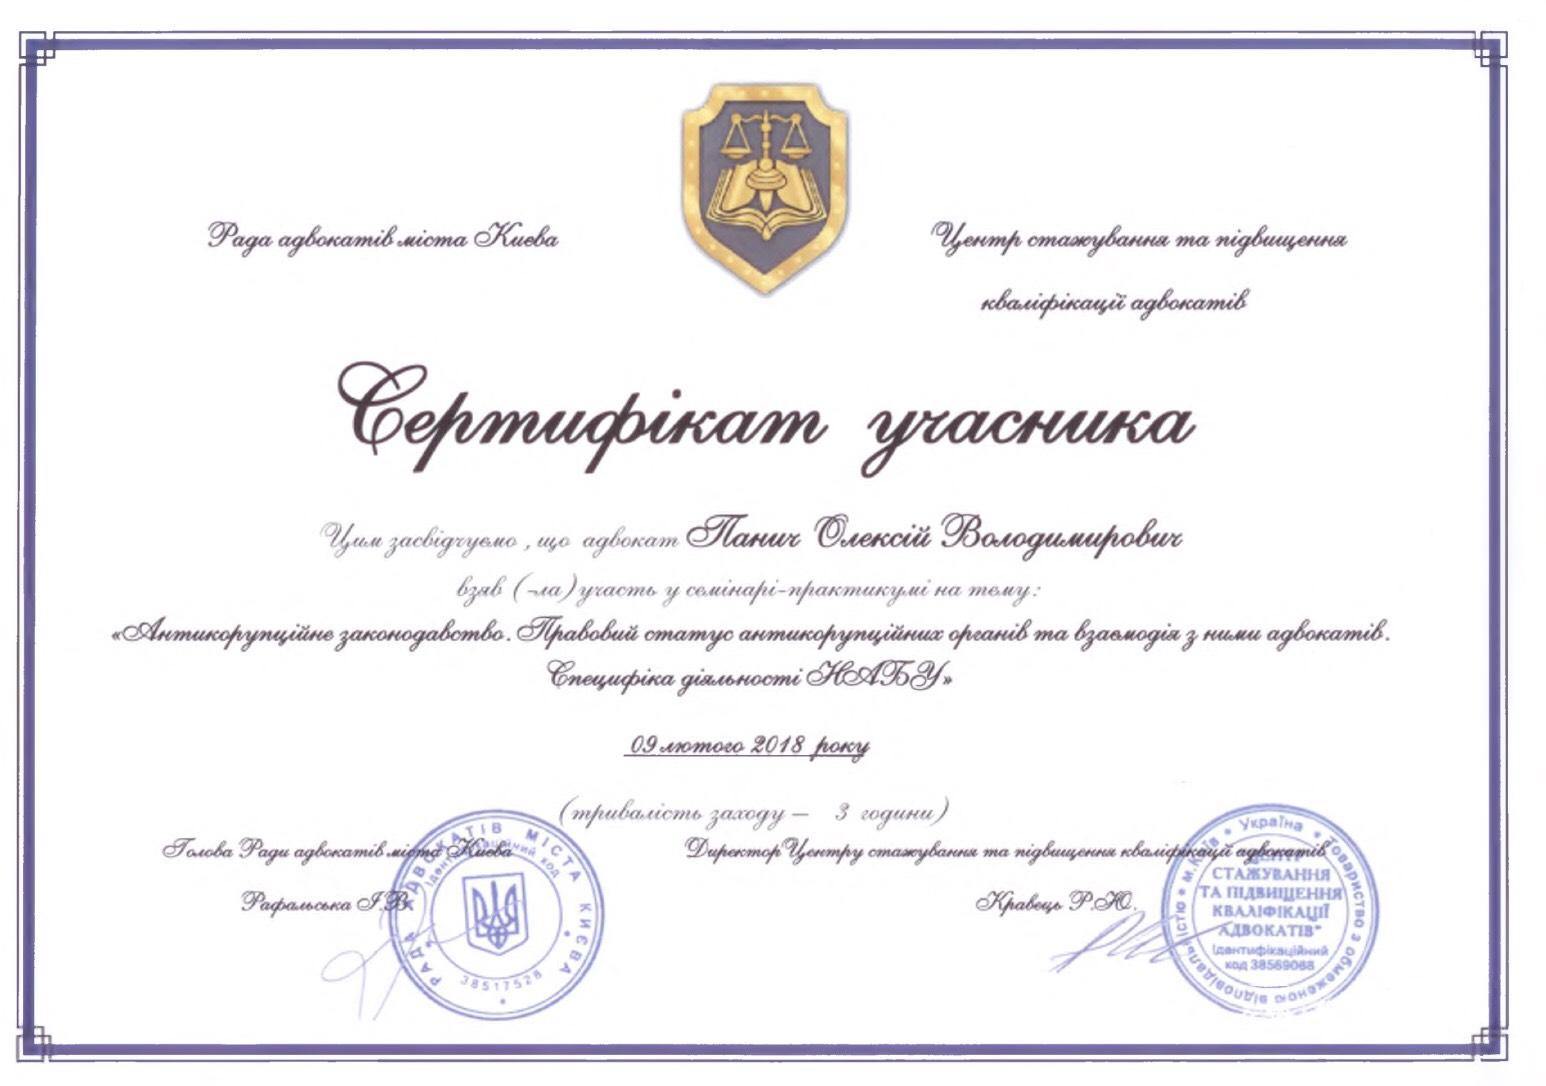 Инколанс юридическая компания, Юридична компанія Інколанс, Incolanse Law Firm